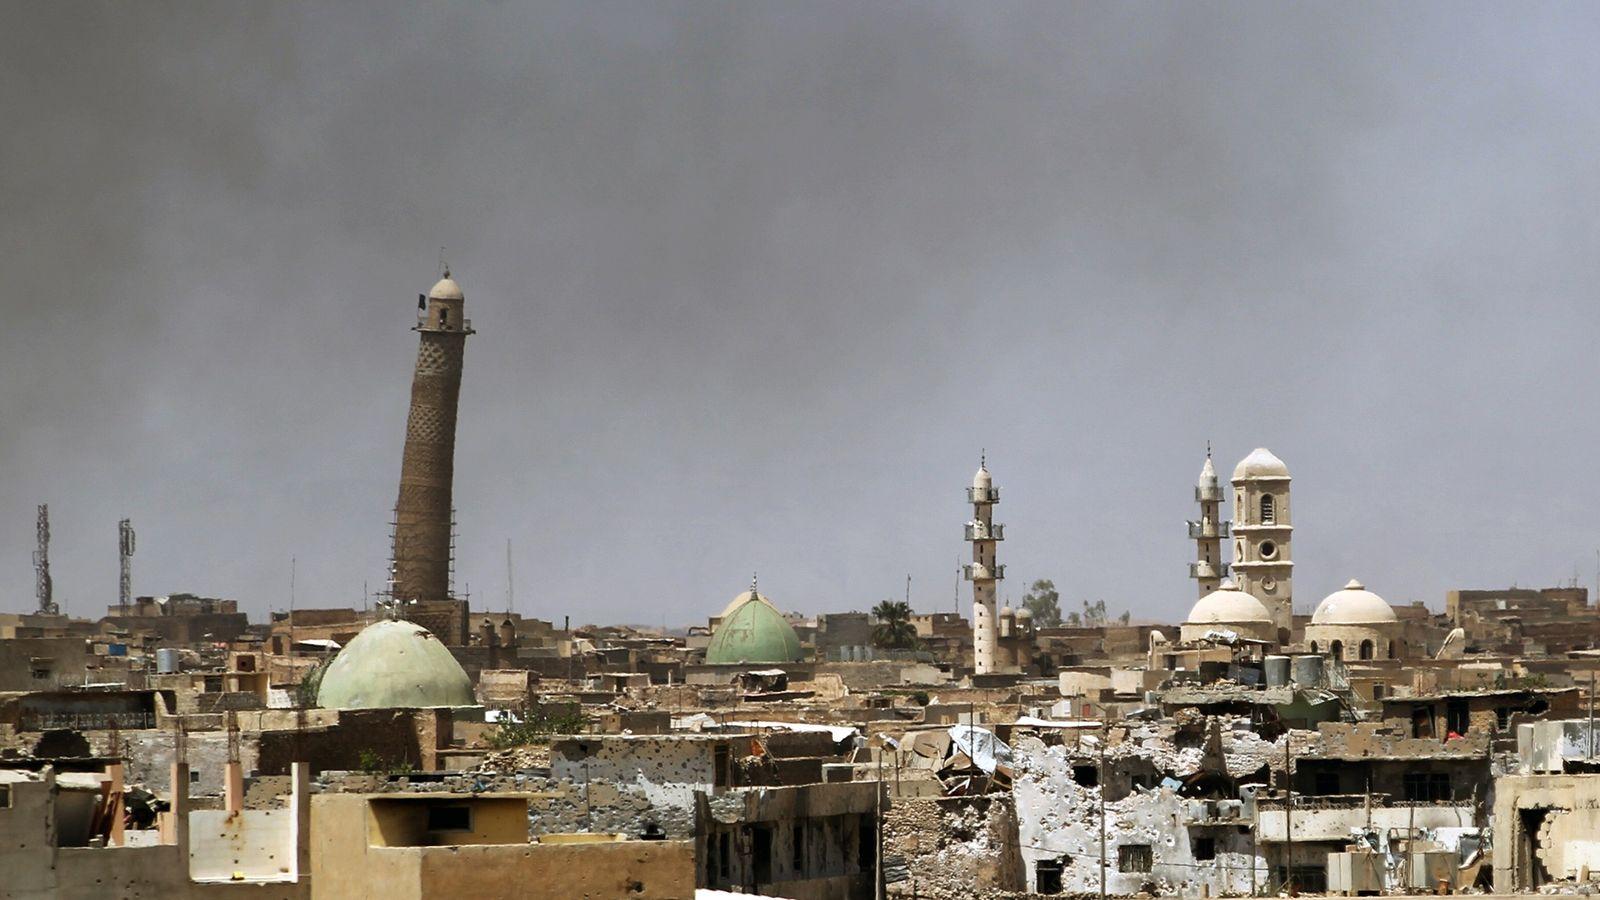 Das Minarett al-Hadba' von Mossul